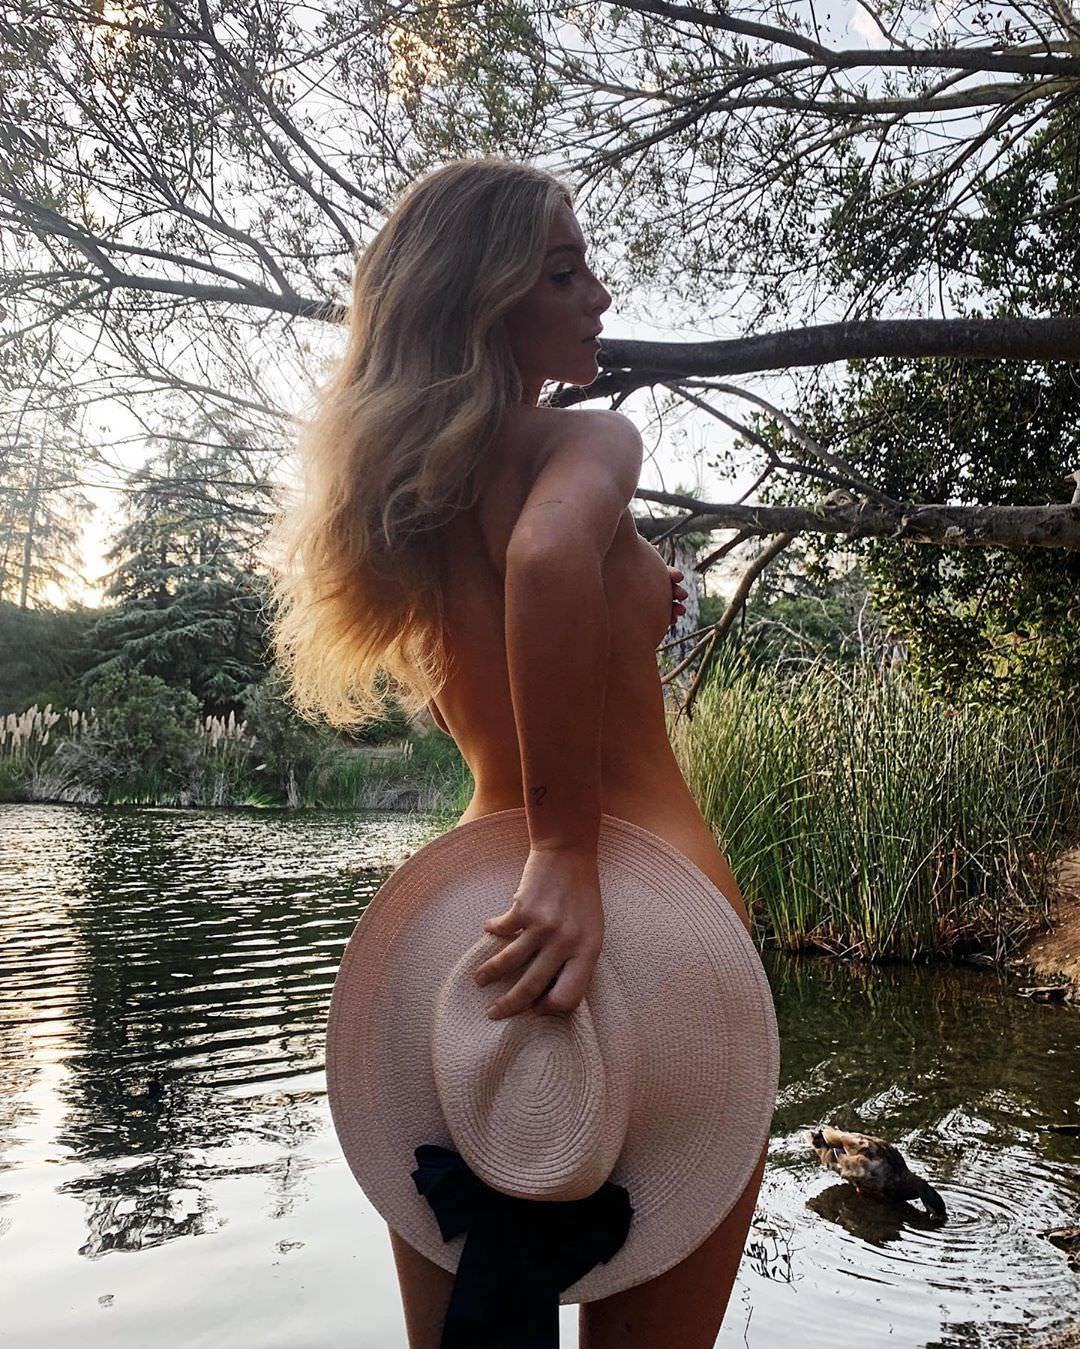 Дейзи Кич фото без одежды